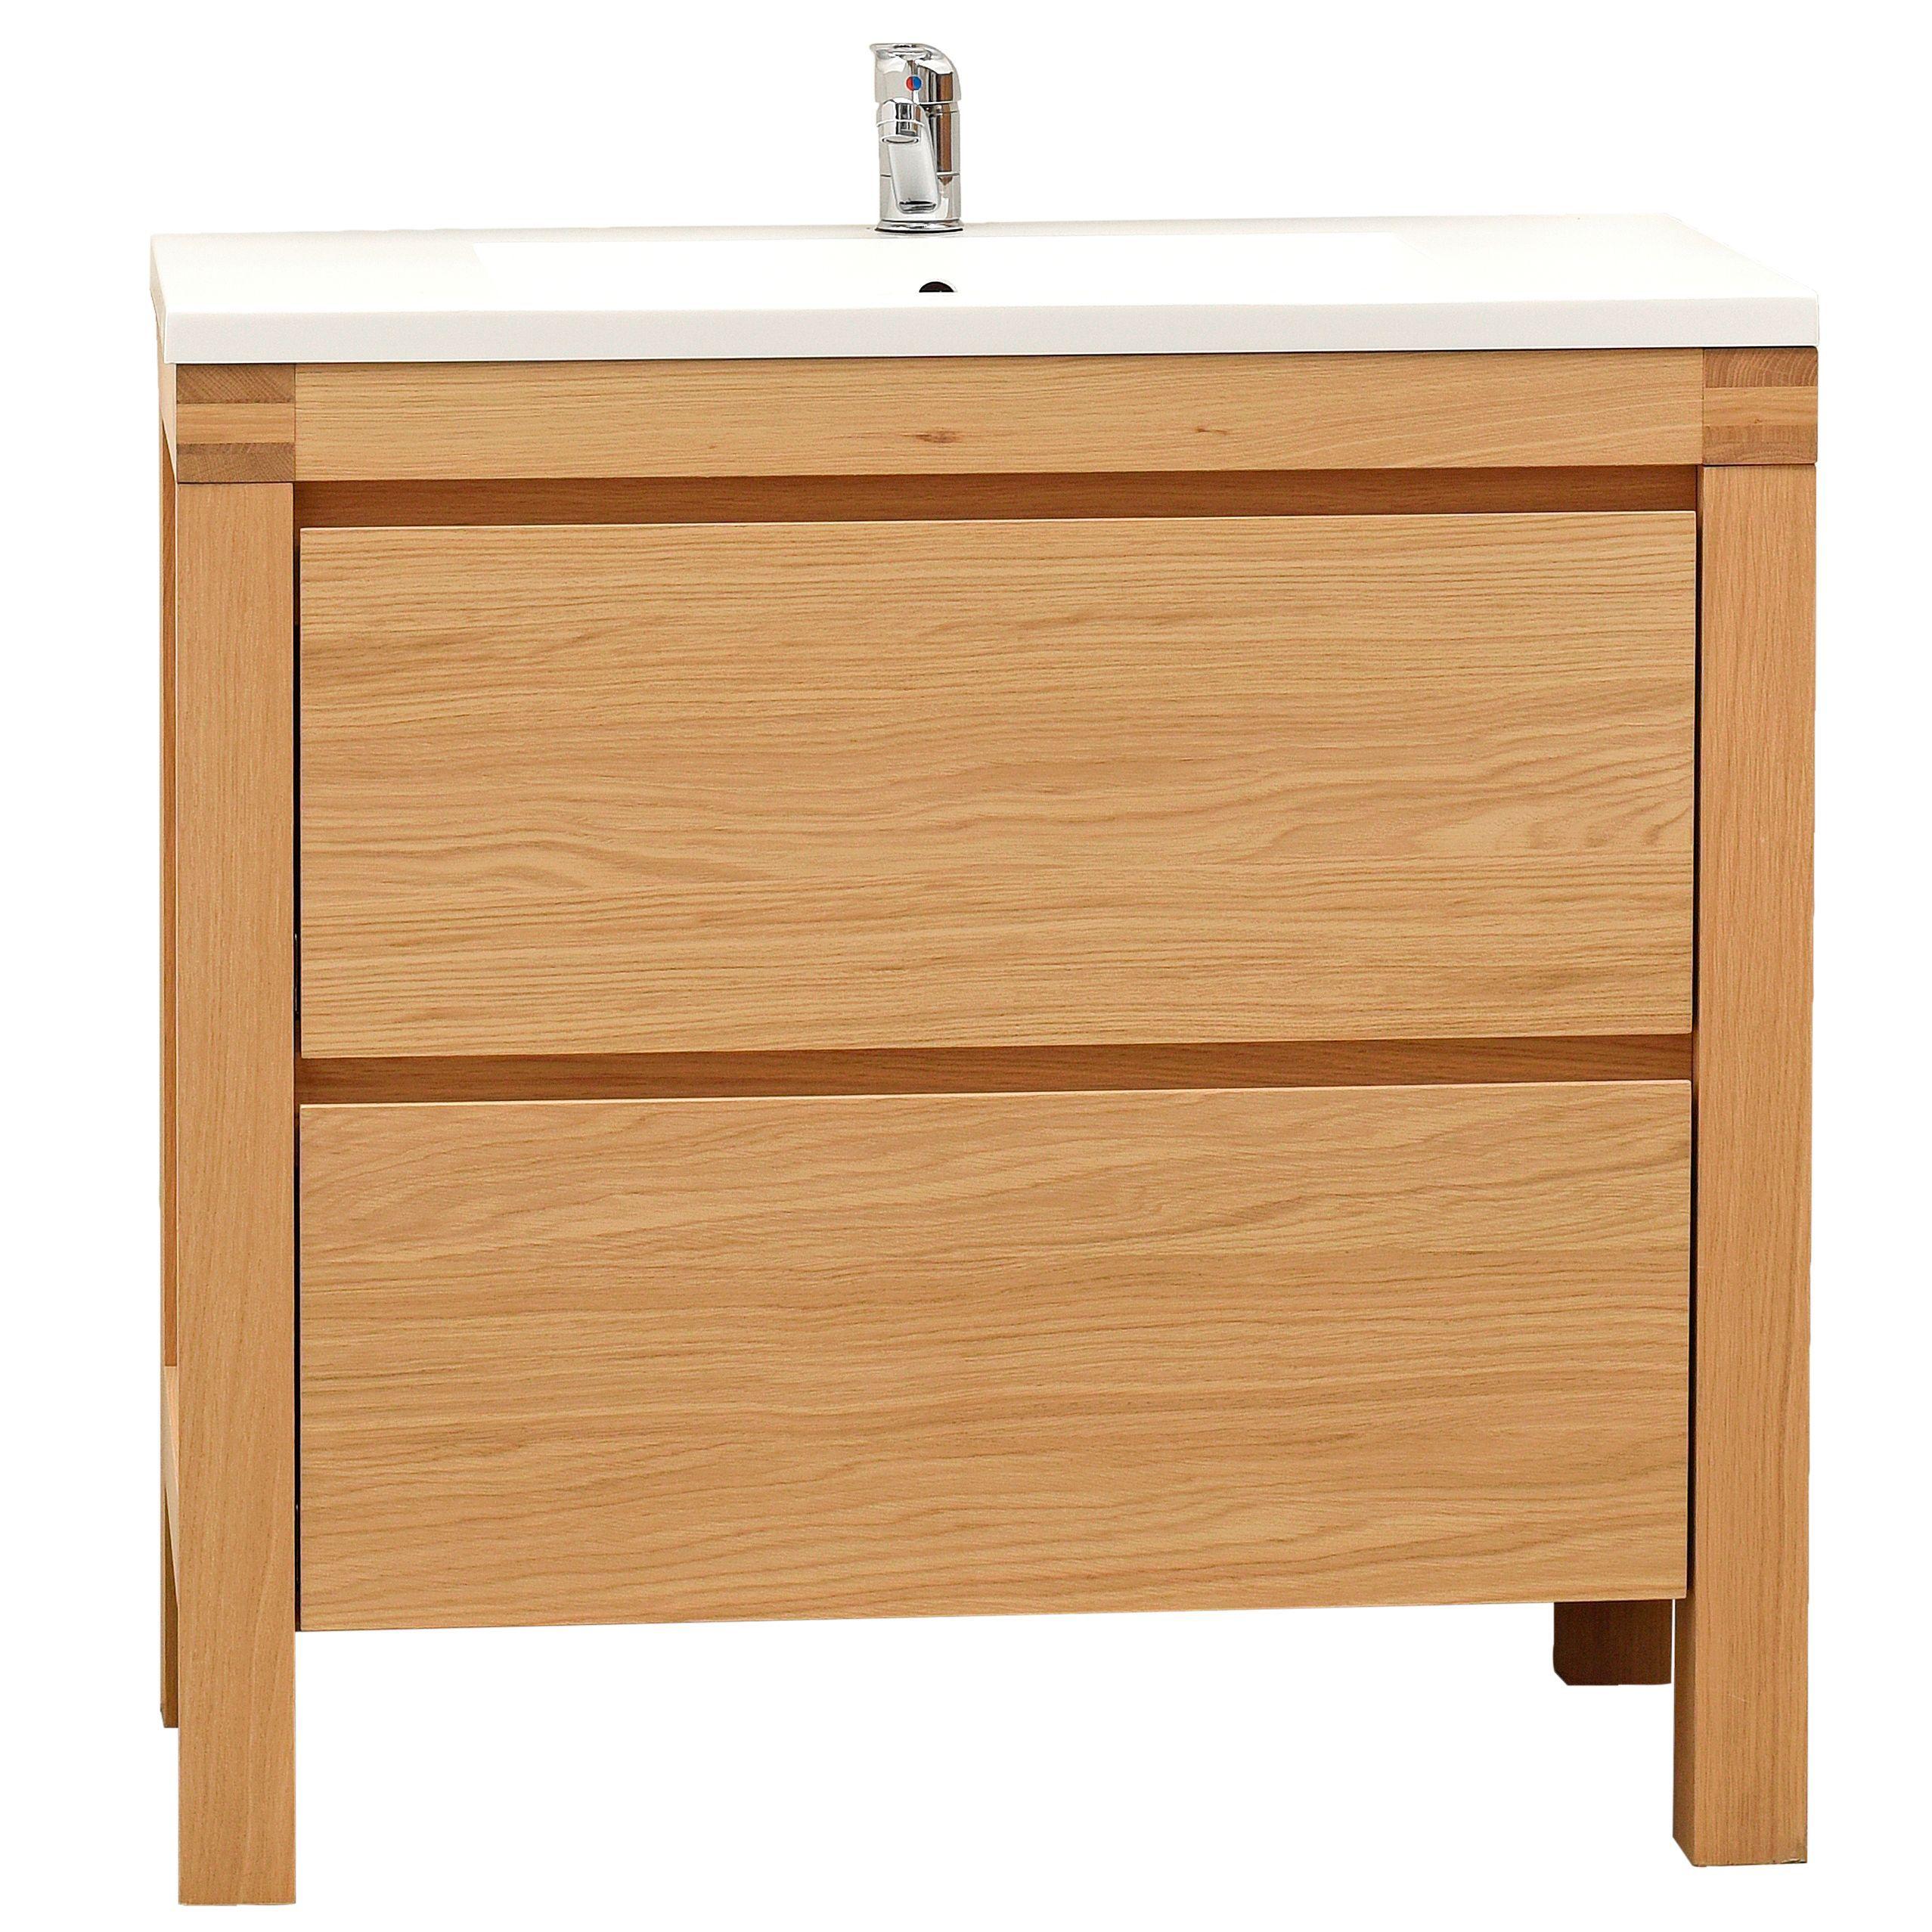 Bathroom Vanity Units B Q: Cooke & Lewis Erwan Natural Oak Vanity Unit & Basin Set